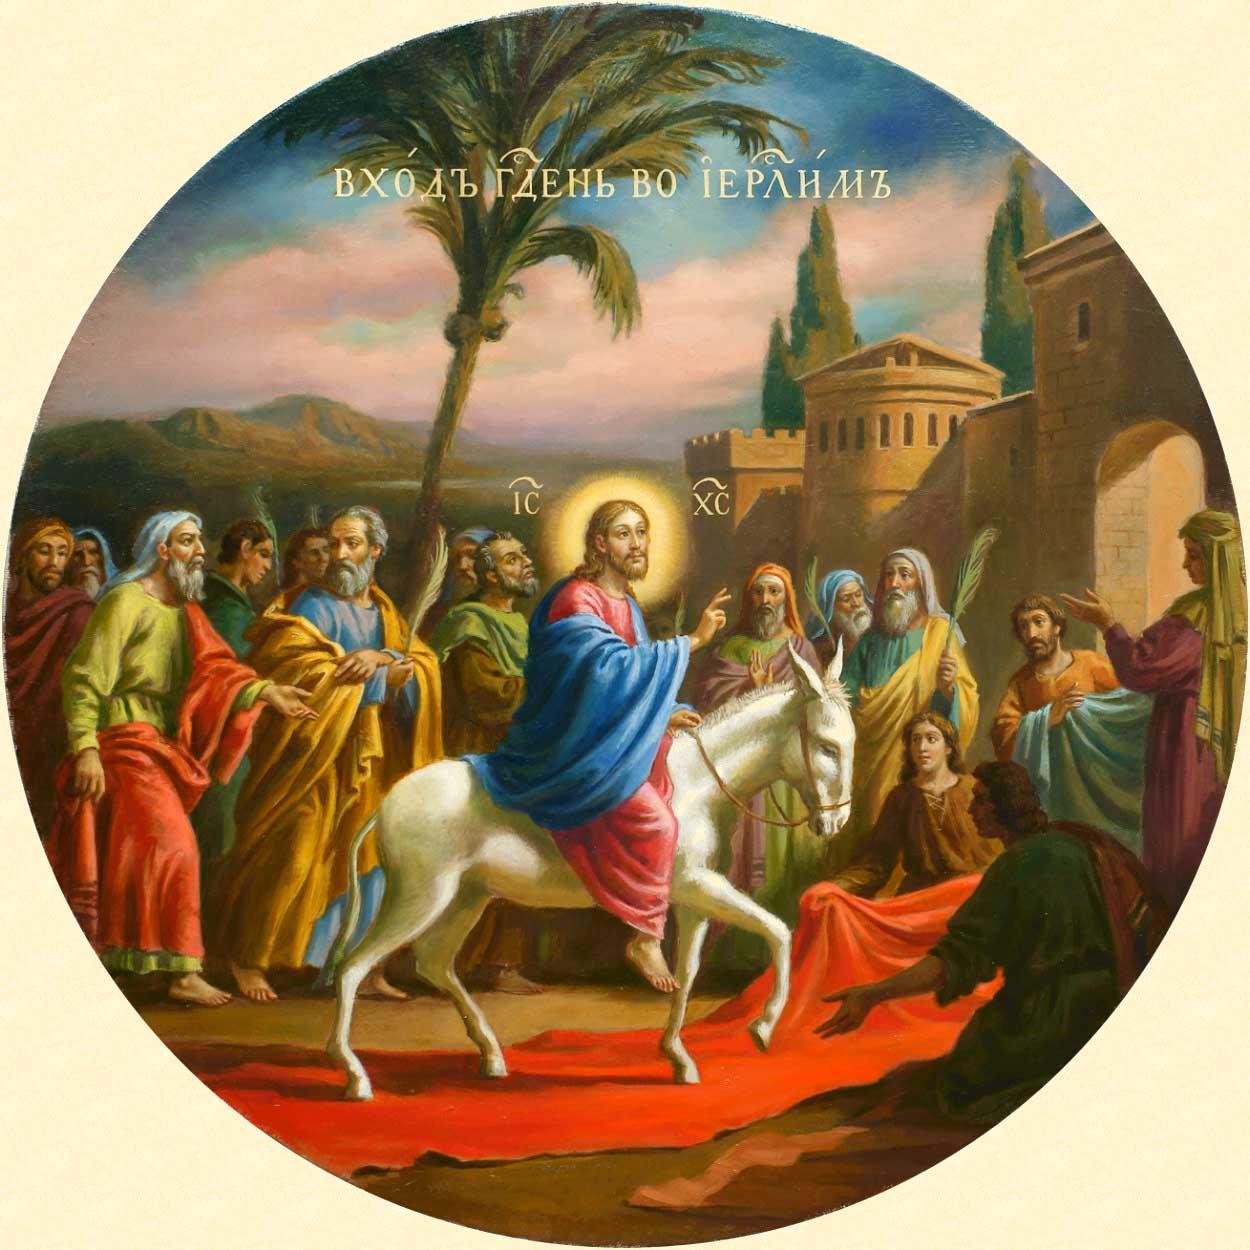 Intrarea-in-Ierusalim-5